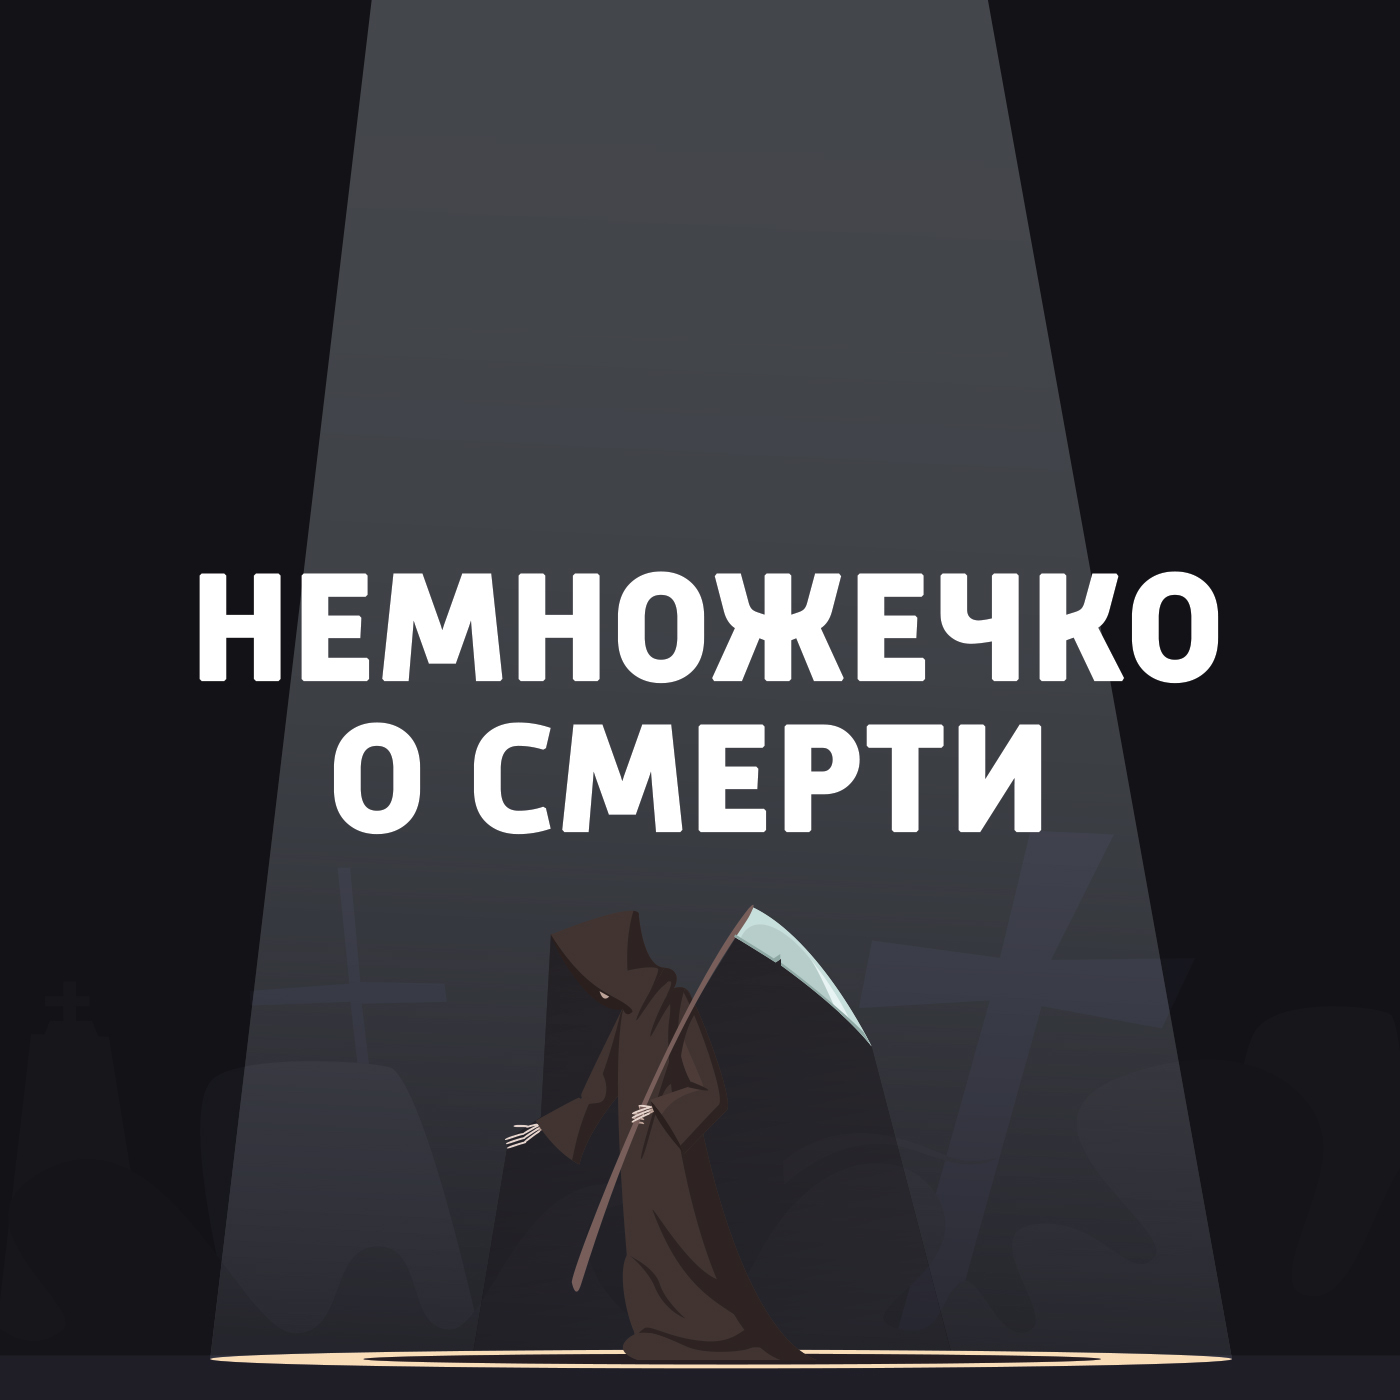 Зигмунд Брайтбарт, Матильда Австрийская и Бобби Лич